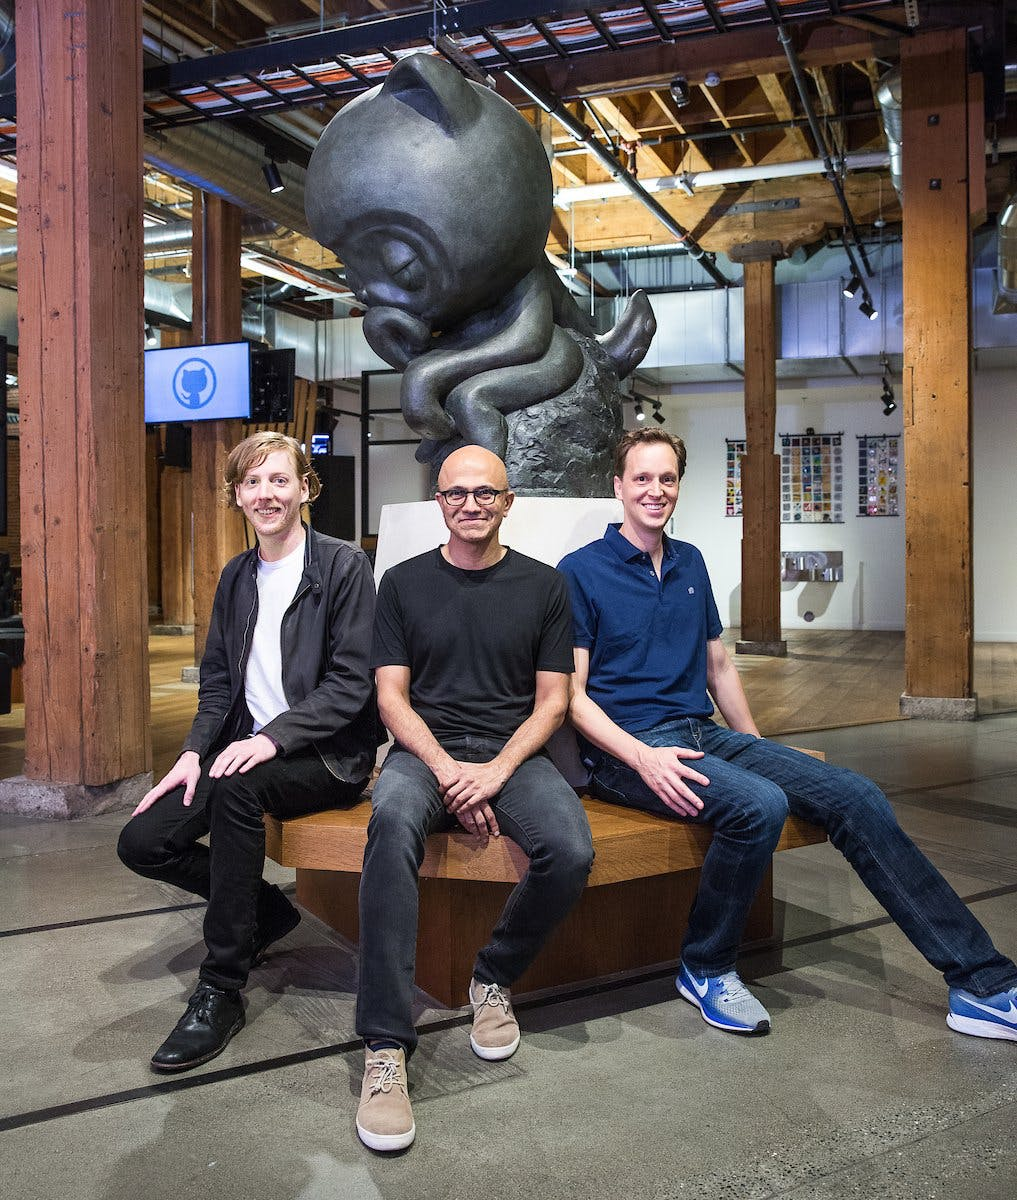 Offiziell: Microsoft übernimmt Github für 7,5 Milliarden Dollar